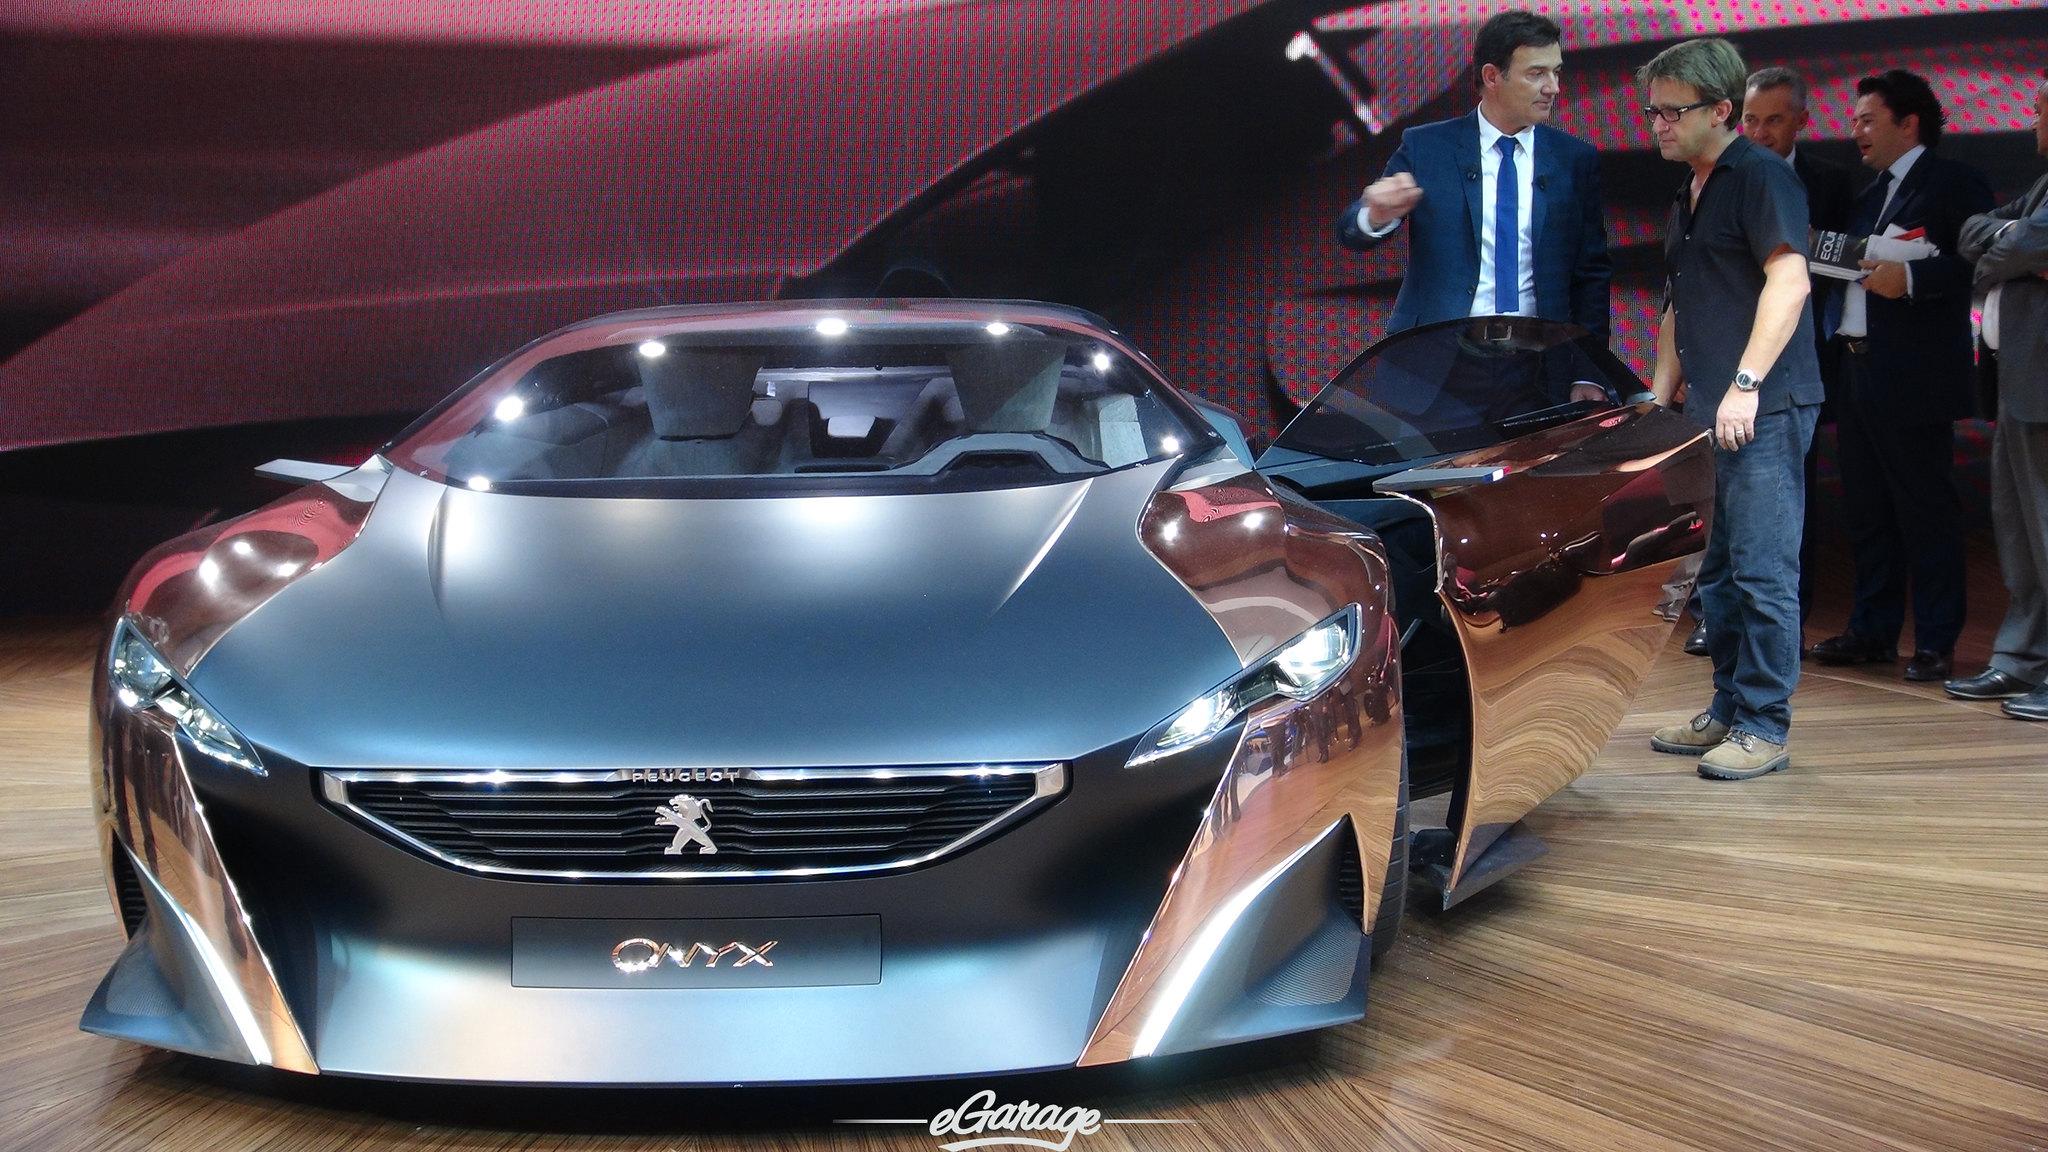 8034741081 5763ef5f76 k 2012 Paris Motor Show